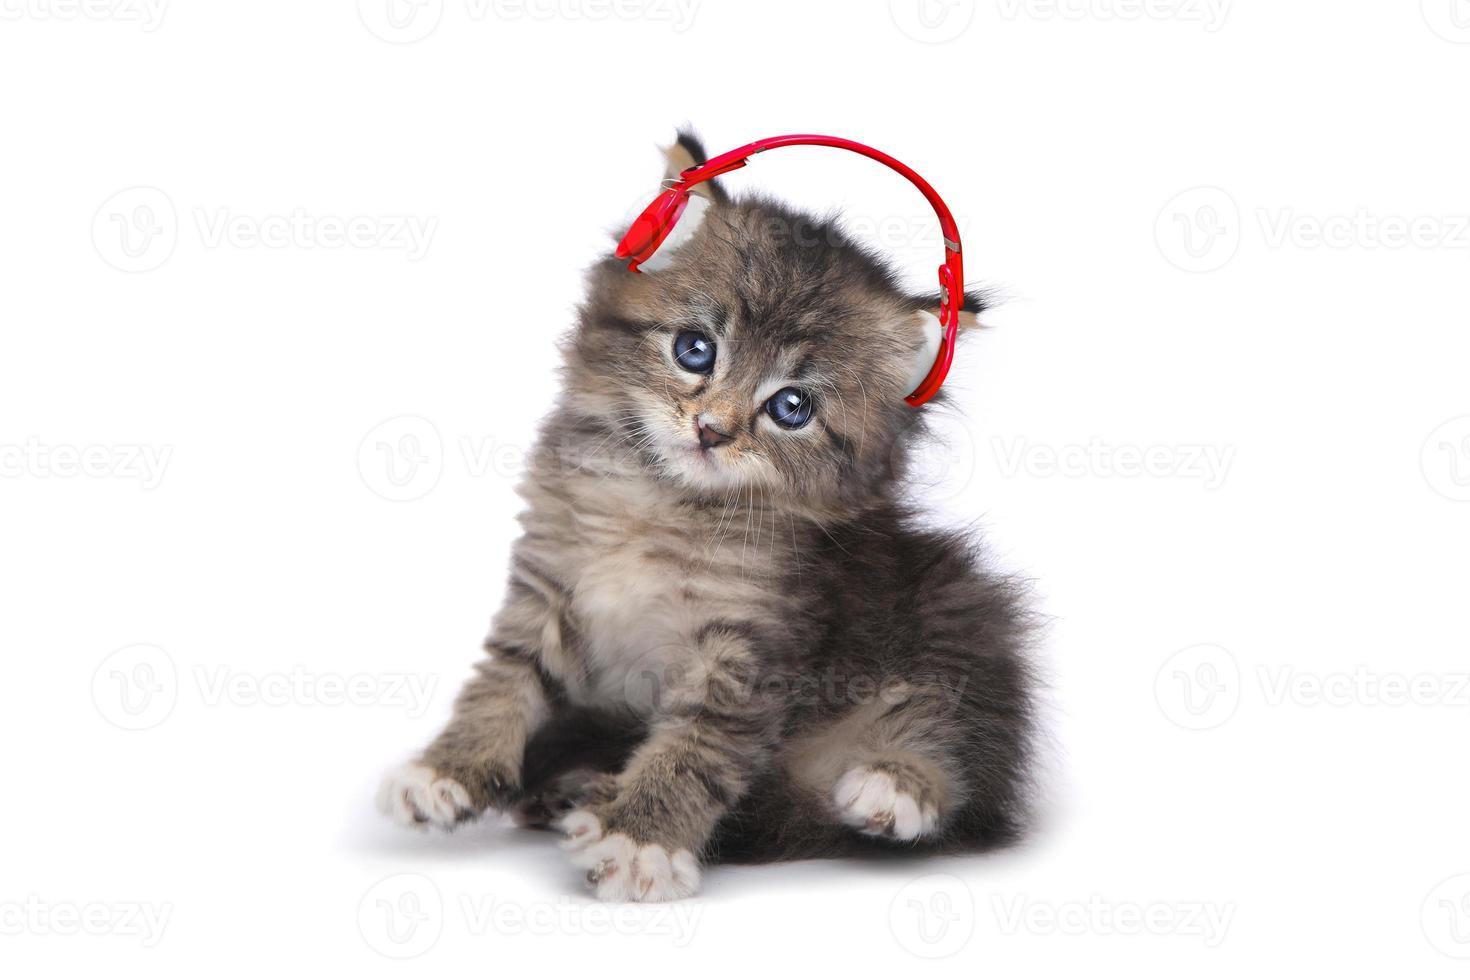 kattunge på en vit bakgrund lyssnar på musik foto